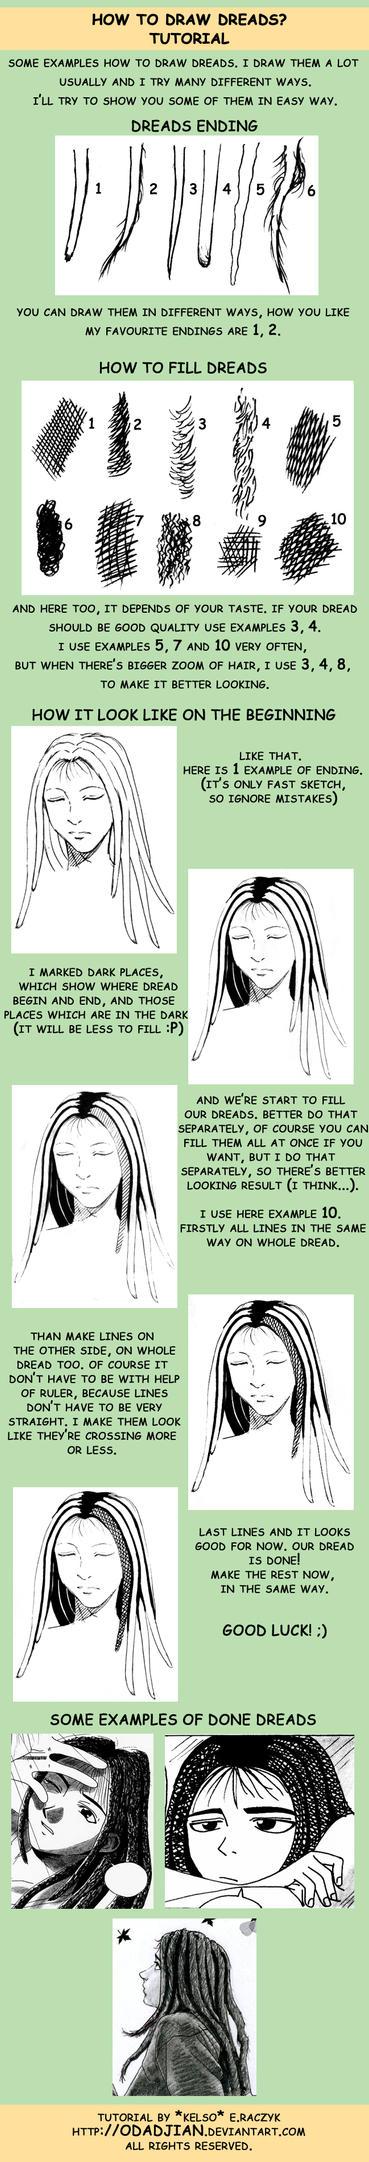 How to draw dreads? English v. by ElaRaczyk